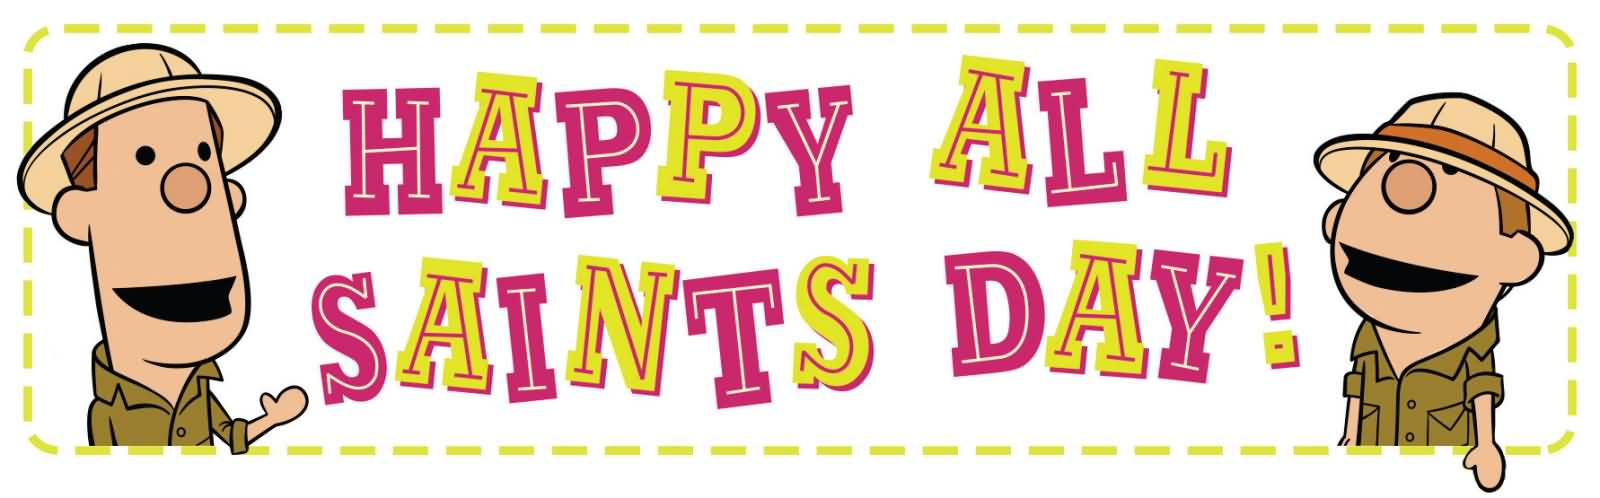 Happy All Saints Day Clipart Header Imag-Happy All Saints Day Clipart Header Image-19